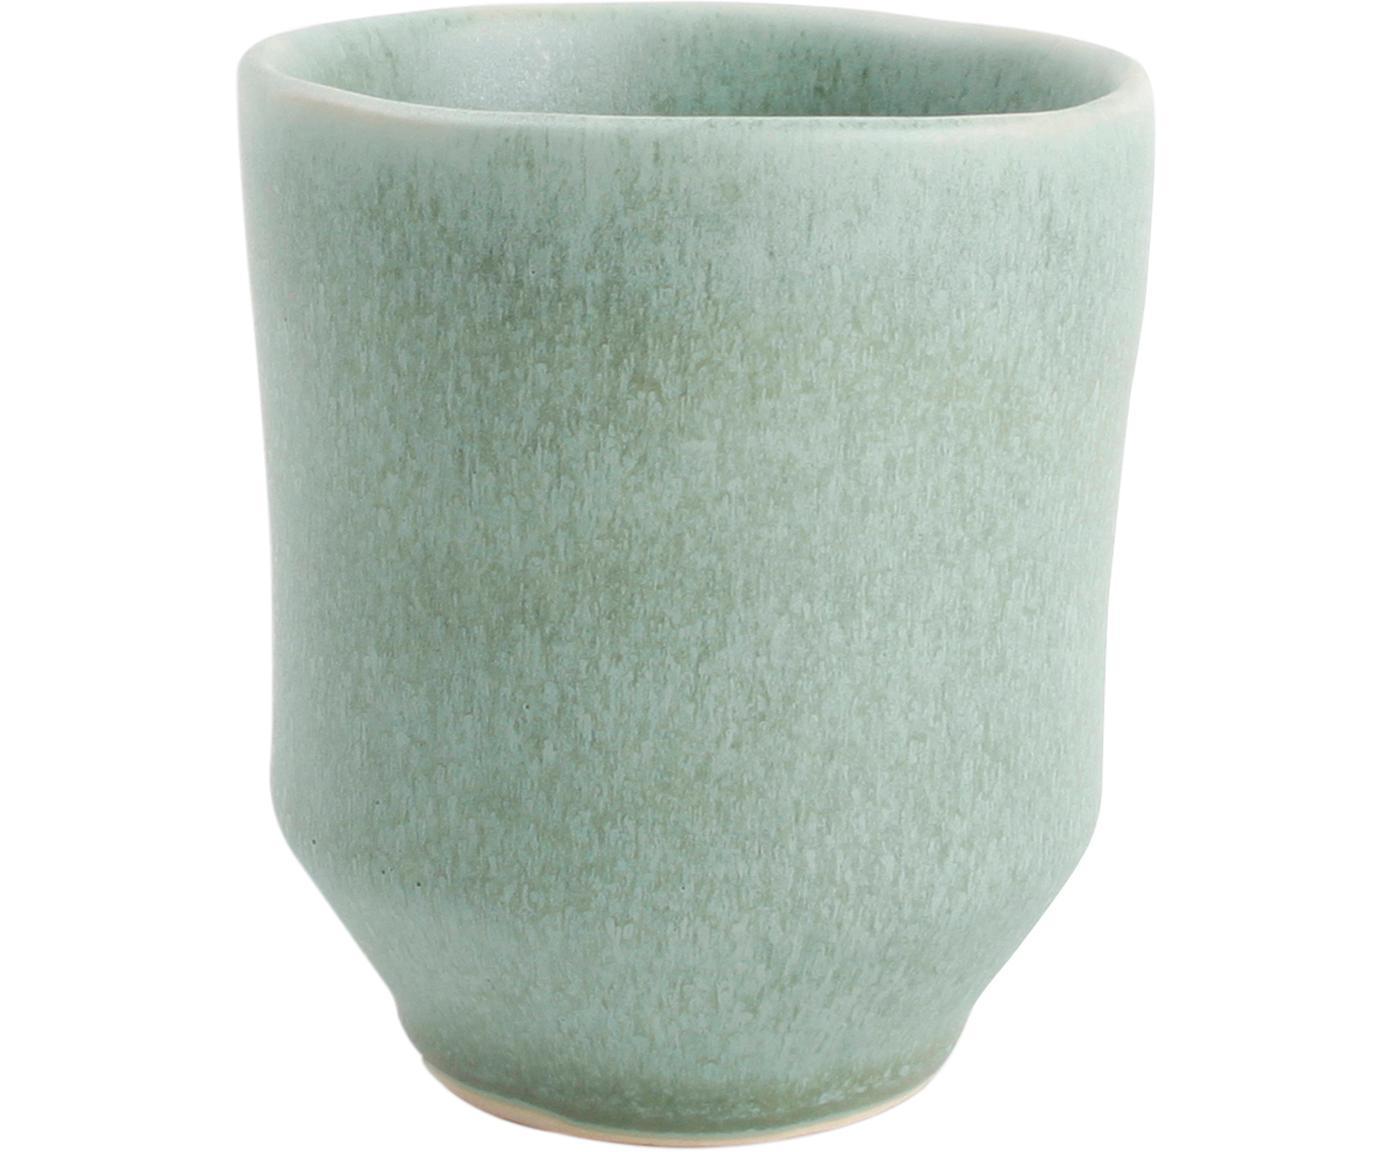 Bekers Glamm, 4 stuks, Keramiek, Groen, Ø 8 x H 9 cm